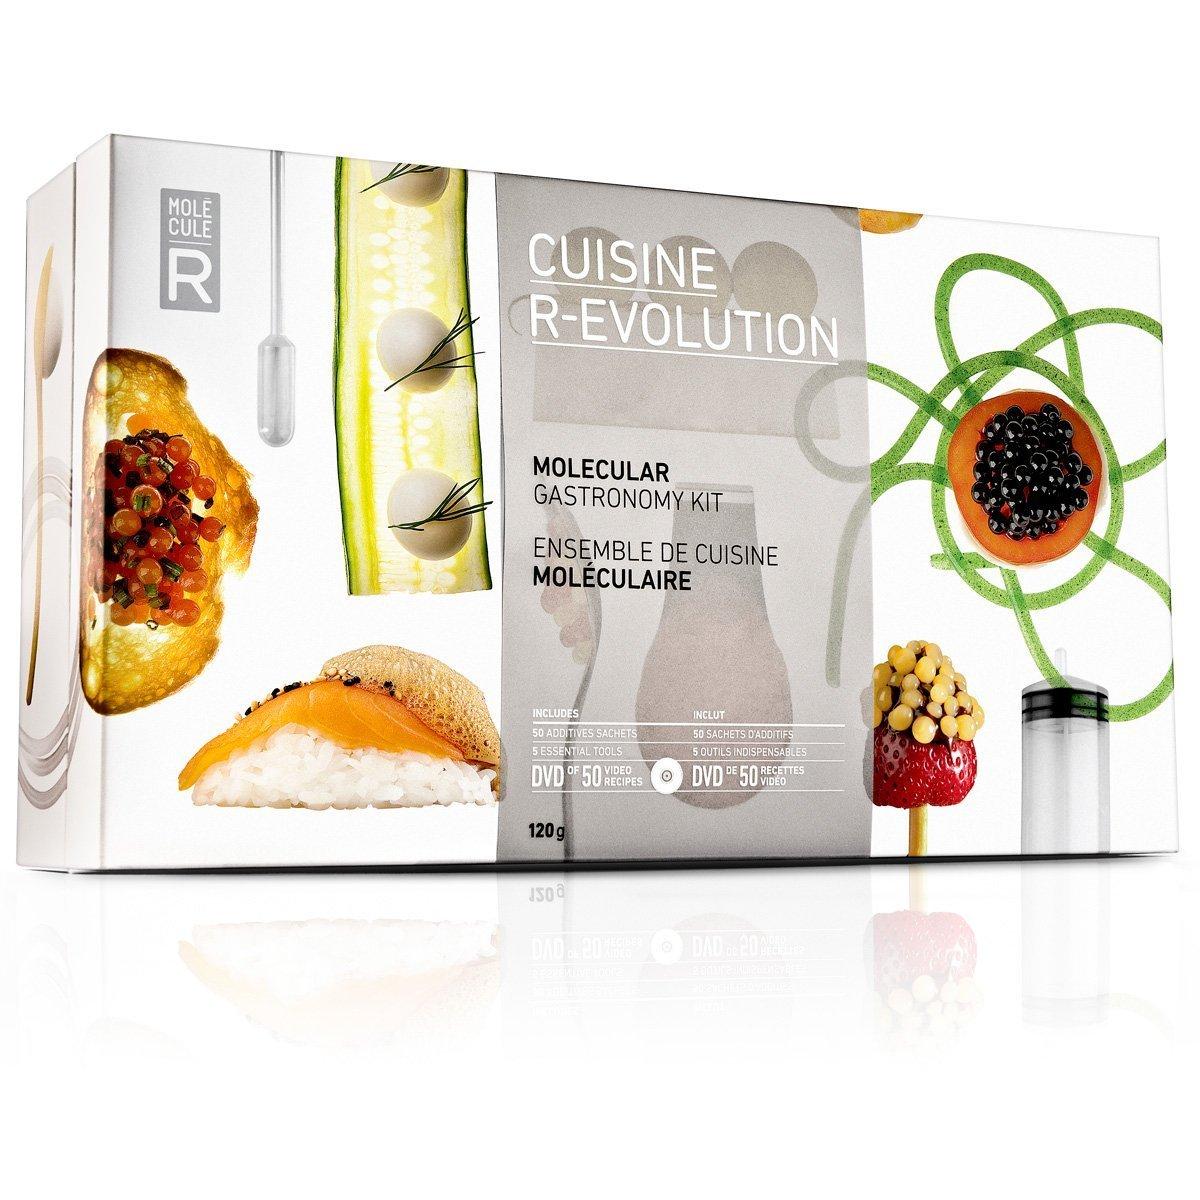 Cuisine R-EVOLUTION (Molecular Gastronomy Kit) Molecule-R 831835000626